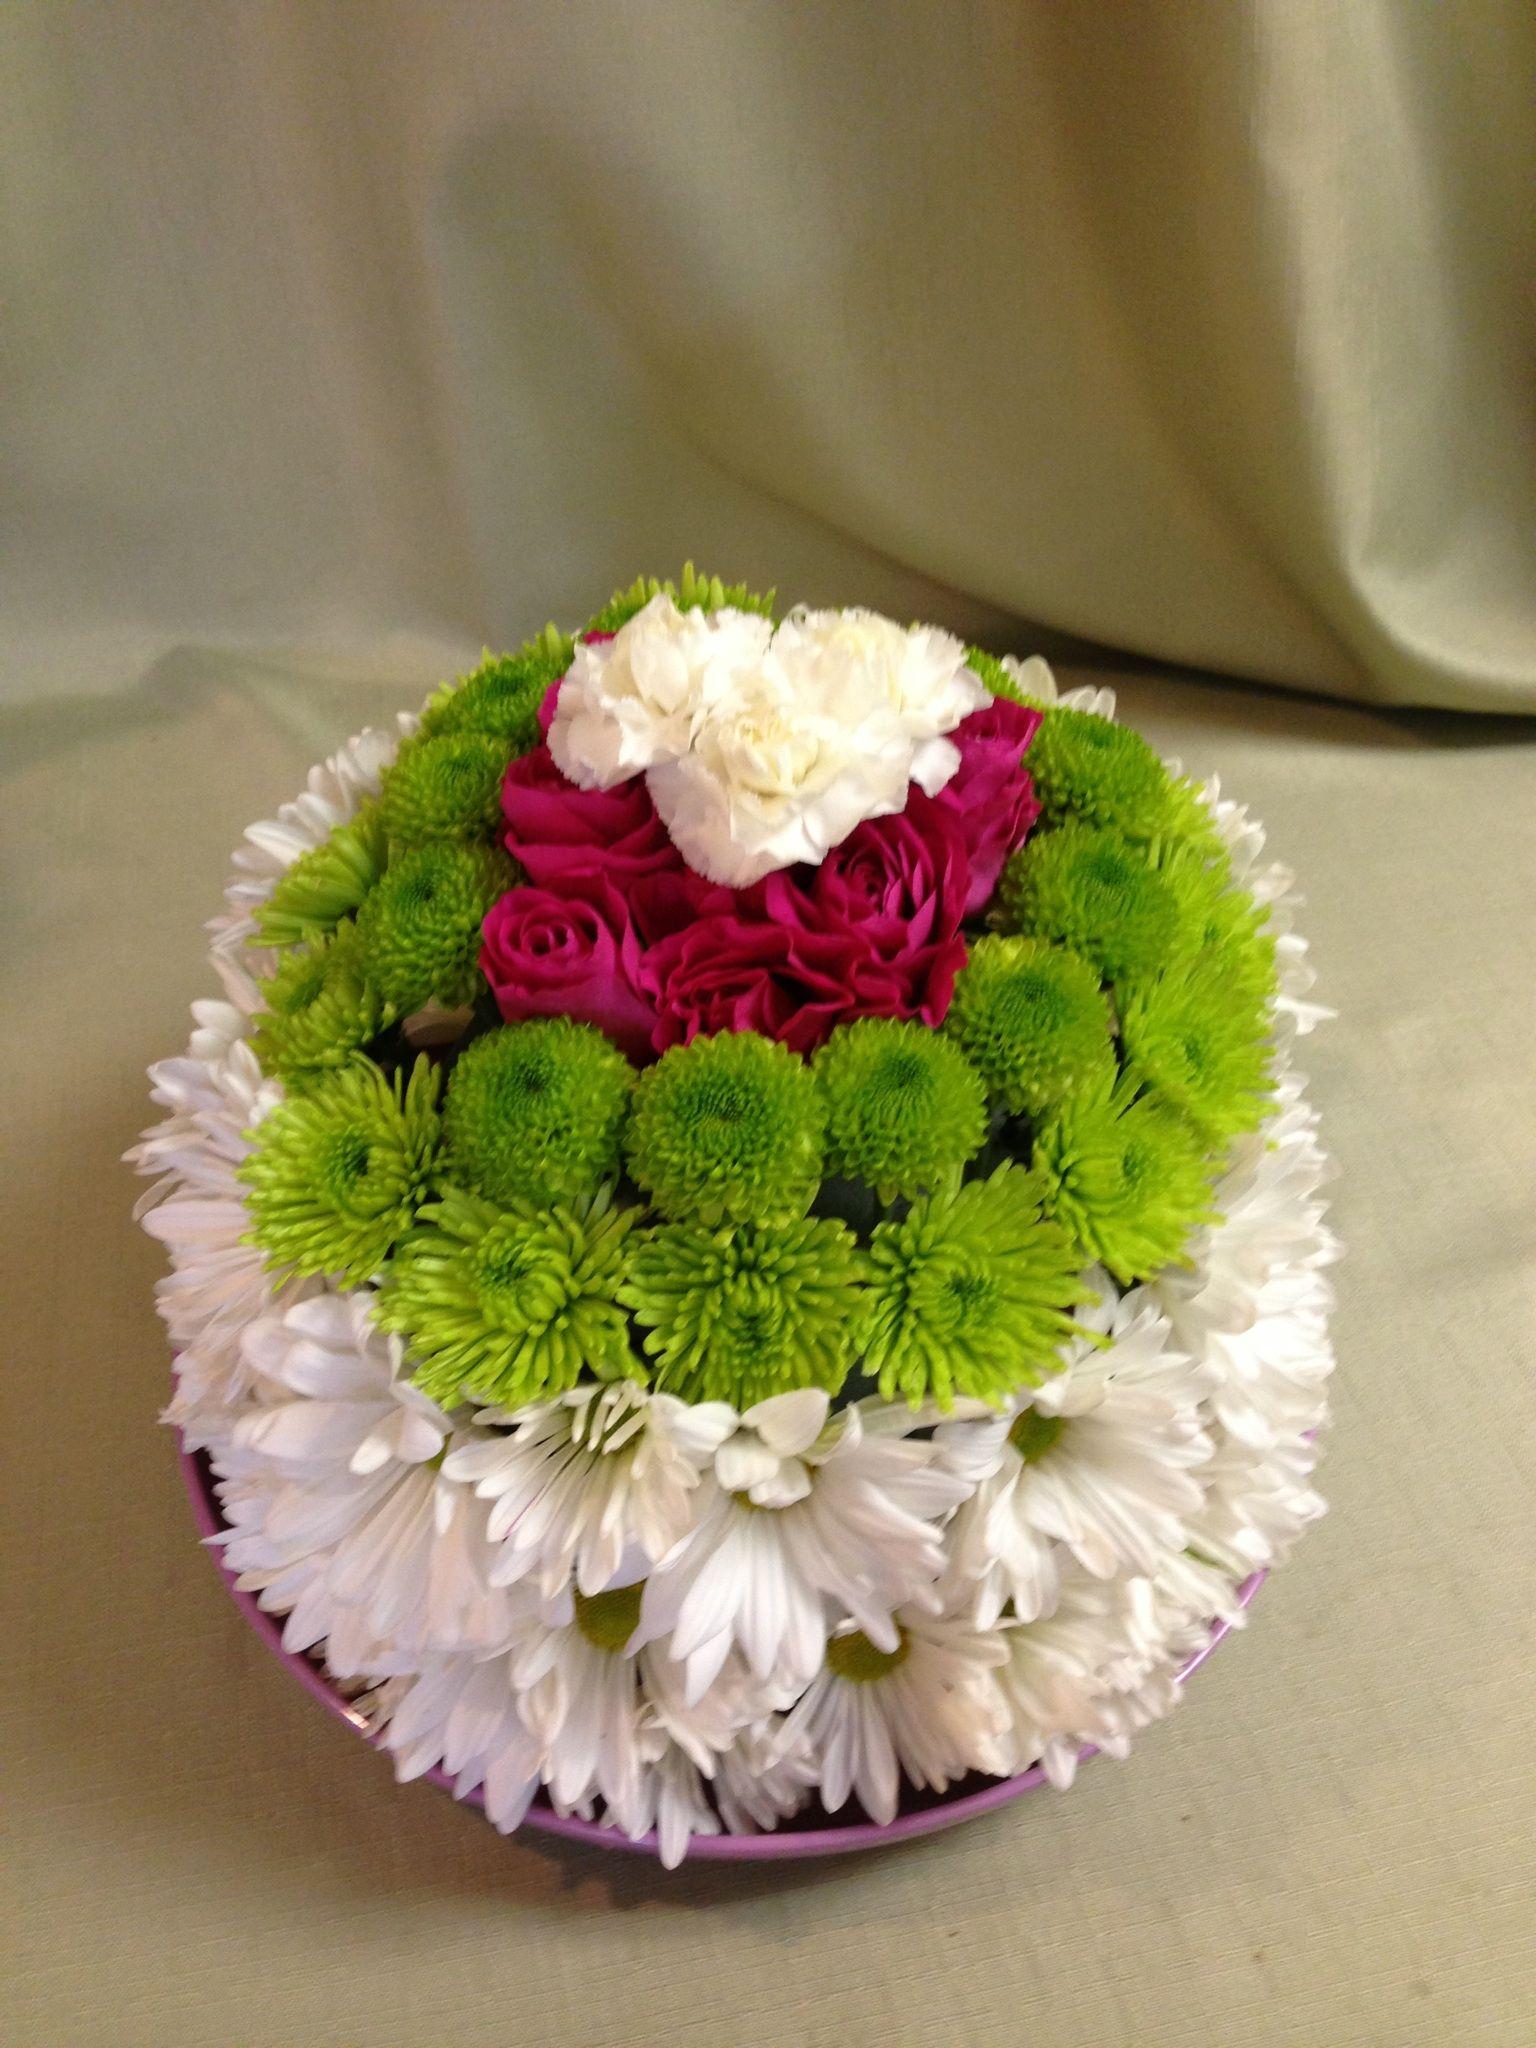 Fl Cake Schneider S Florist Springfield Ohio White Daisy Green On Poms Hot Pink Spray Roses